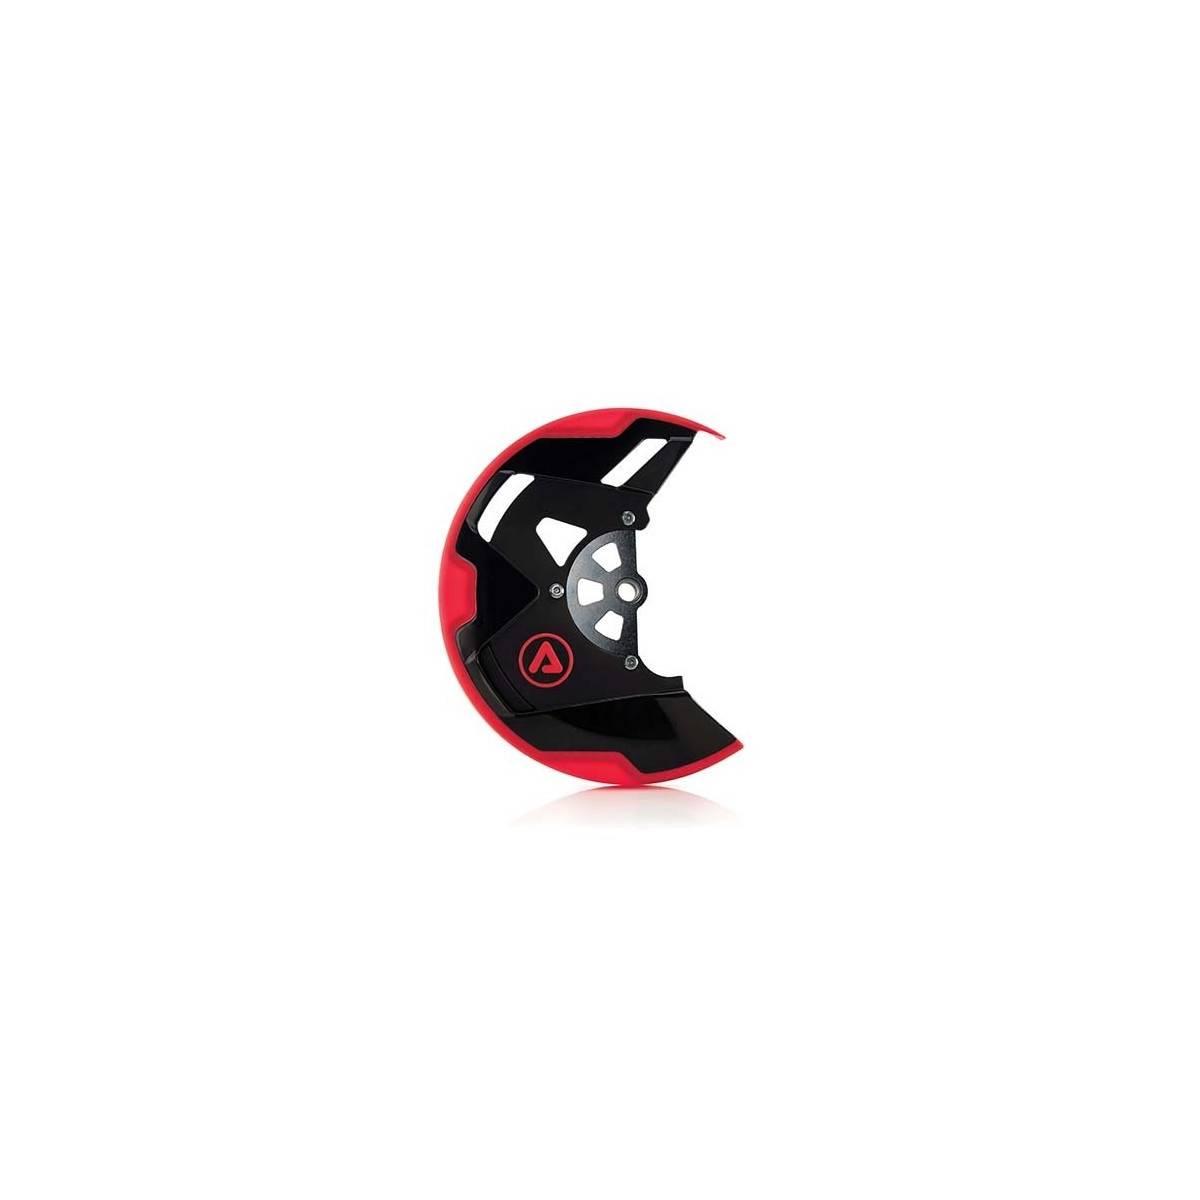 0021647-323 - Protector Disco Delantero Honda Xr400 07 16 Negro Rojo